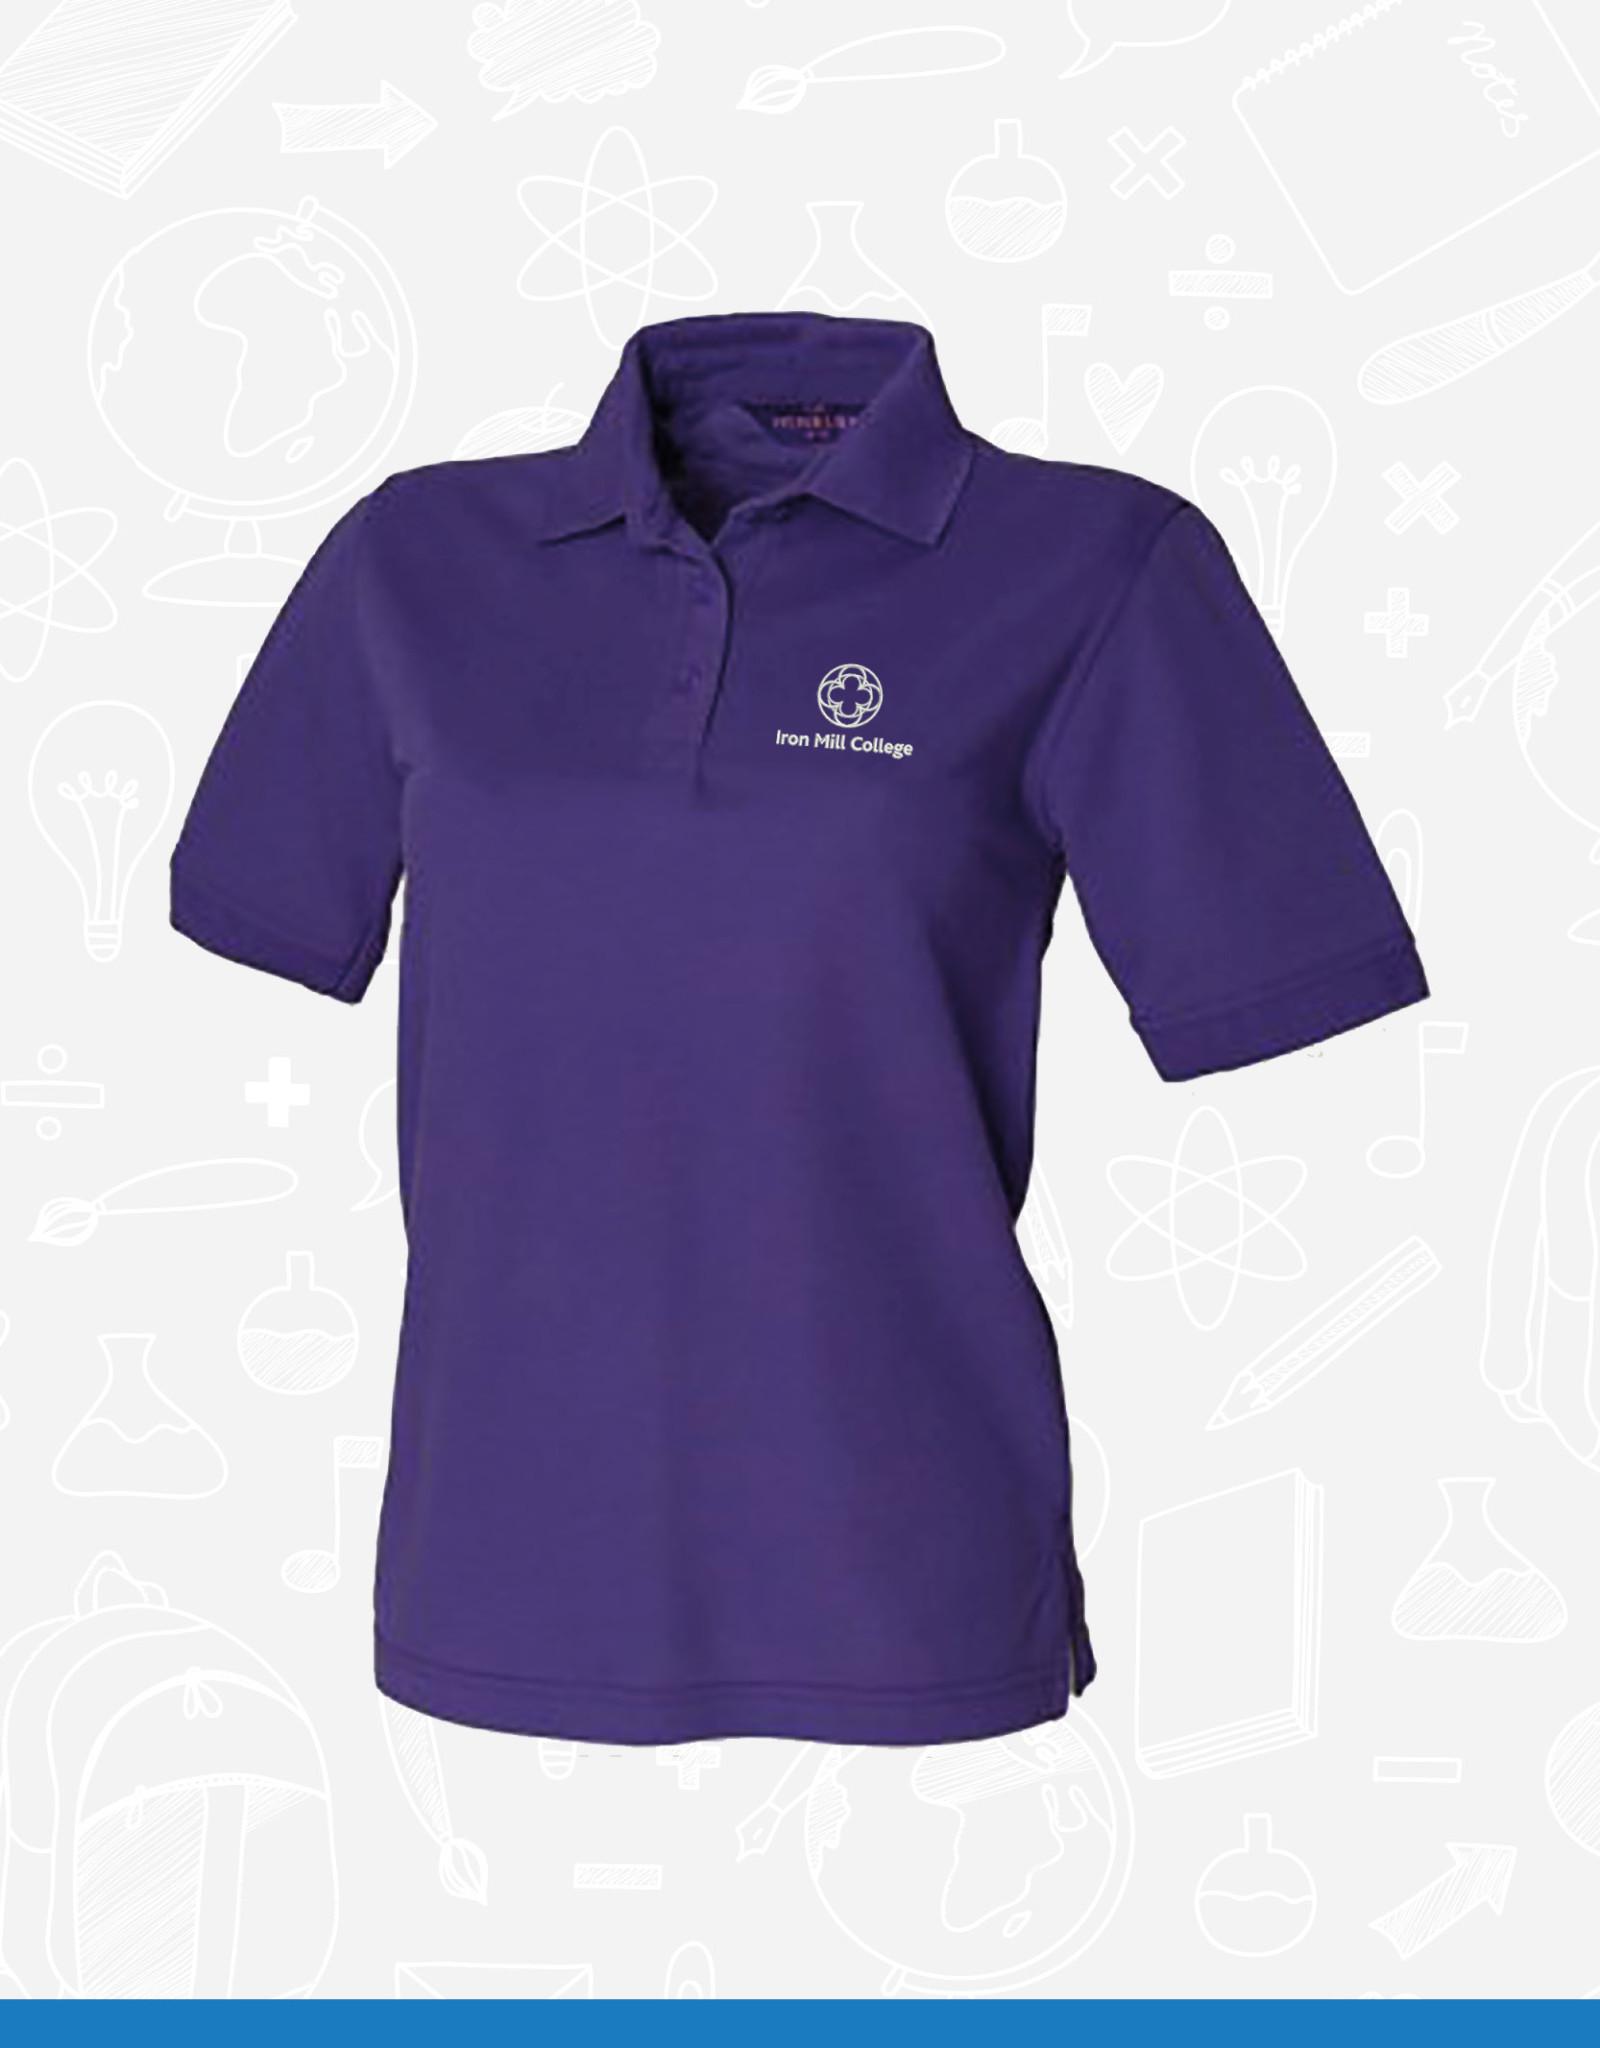 Henbury Iron Mill College - Ladies Purple Polo (H401)